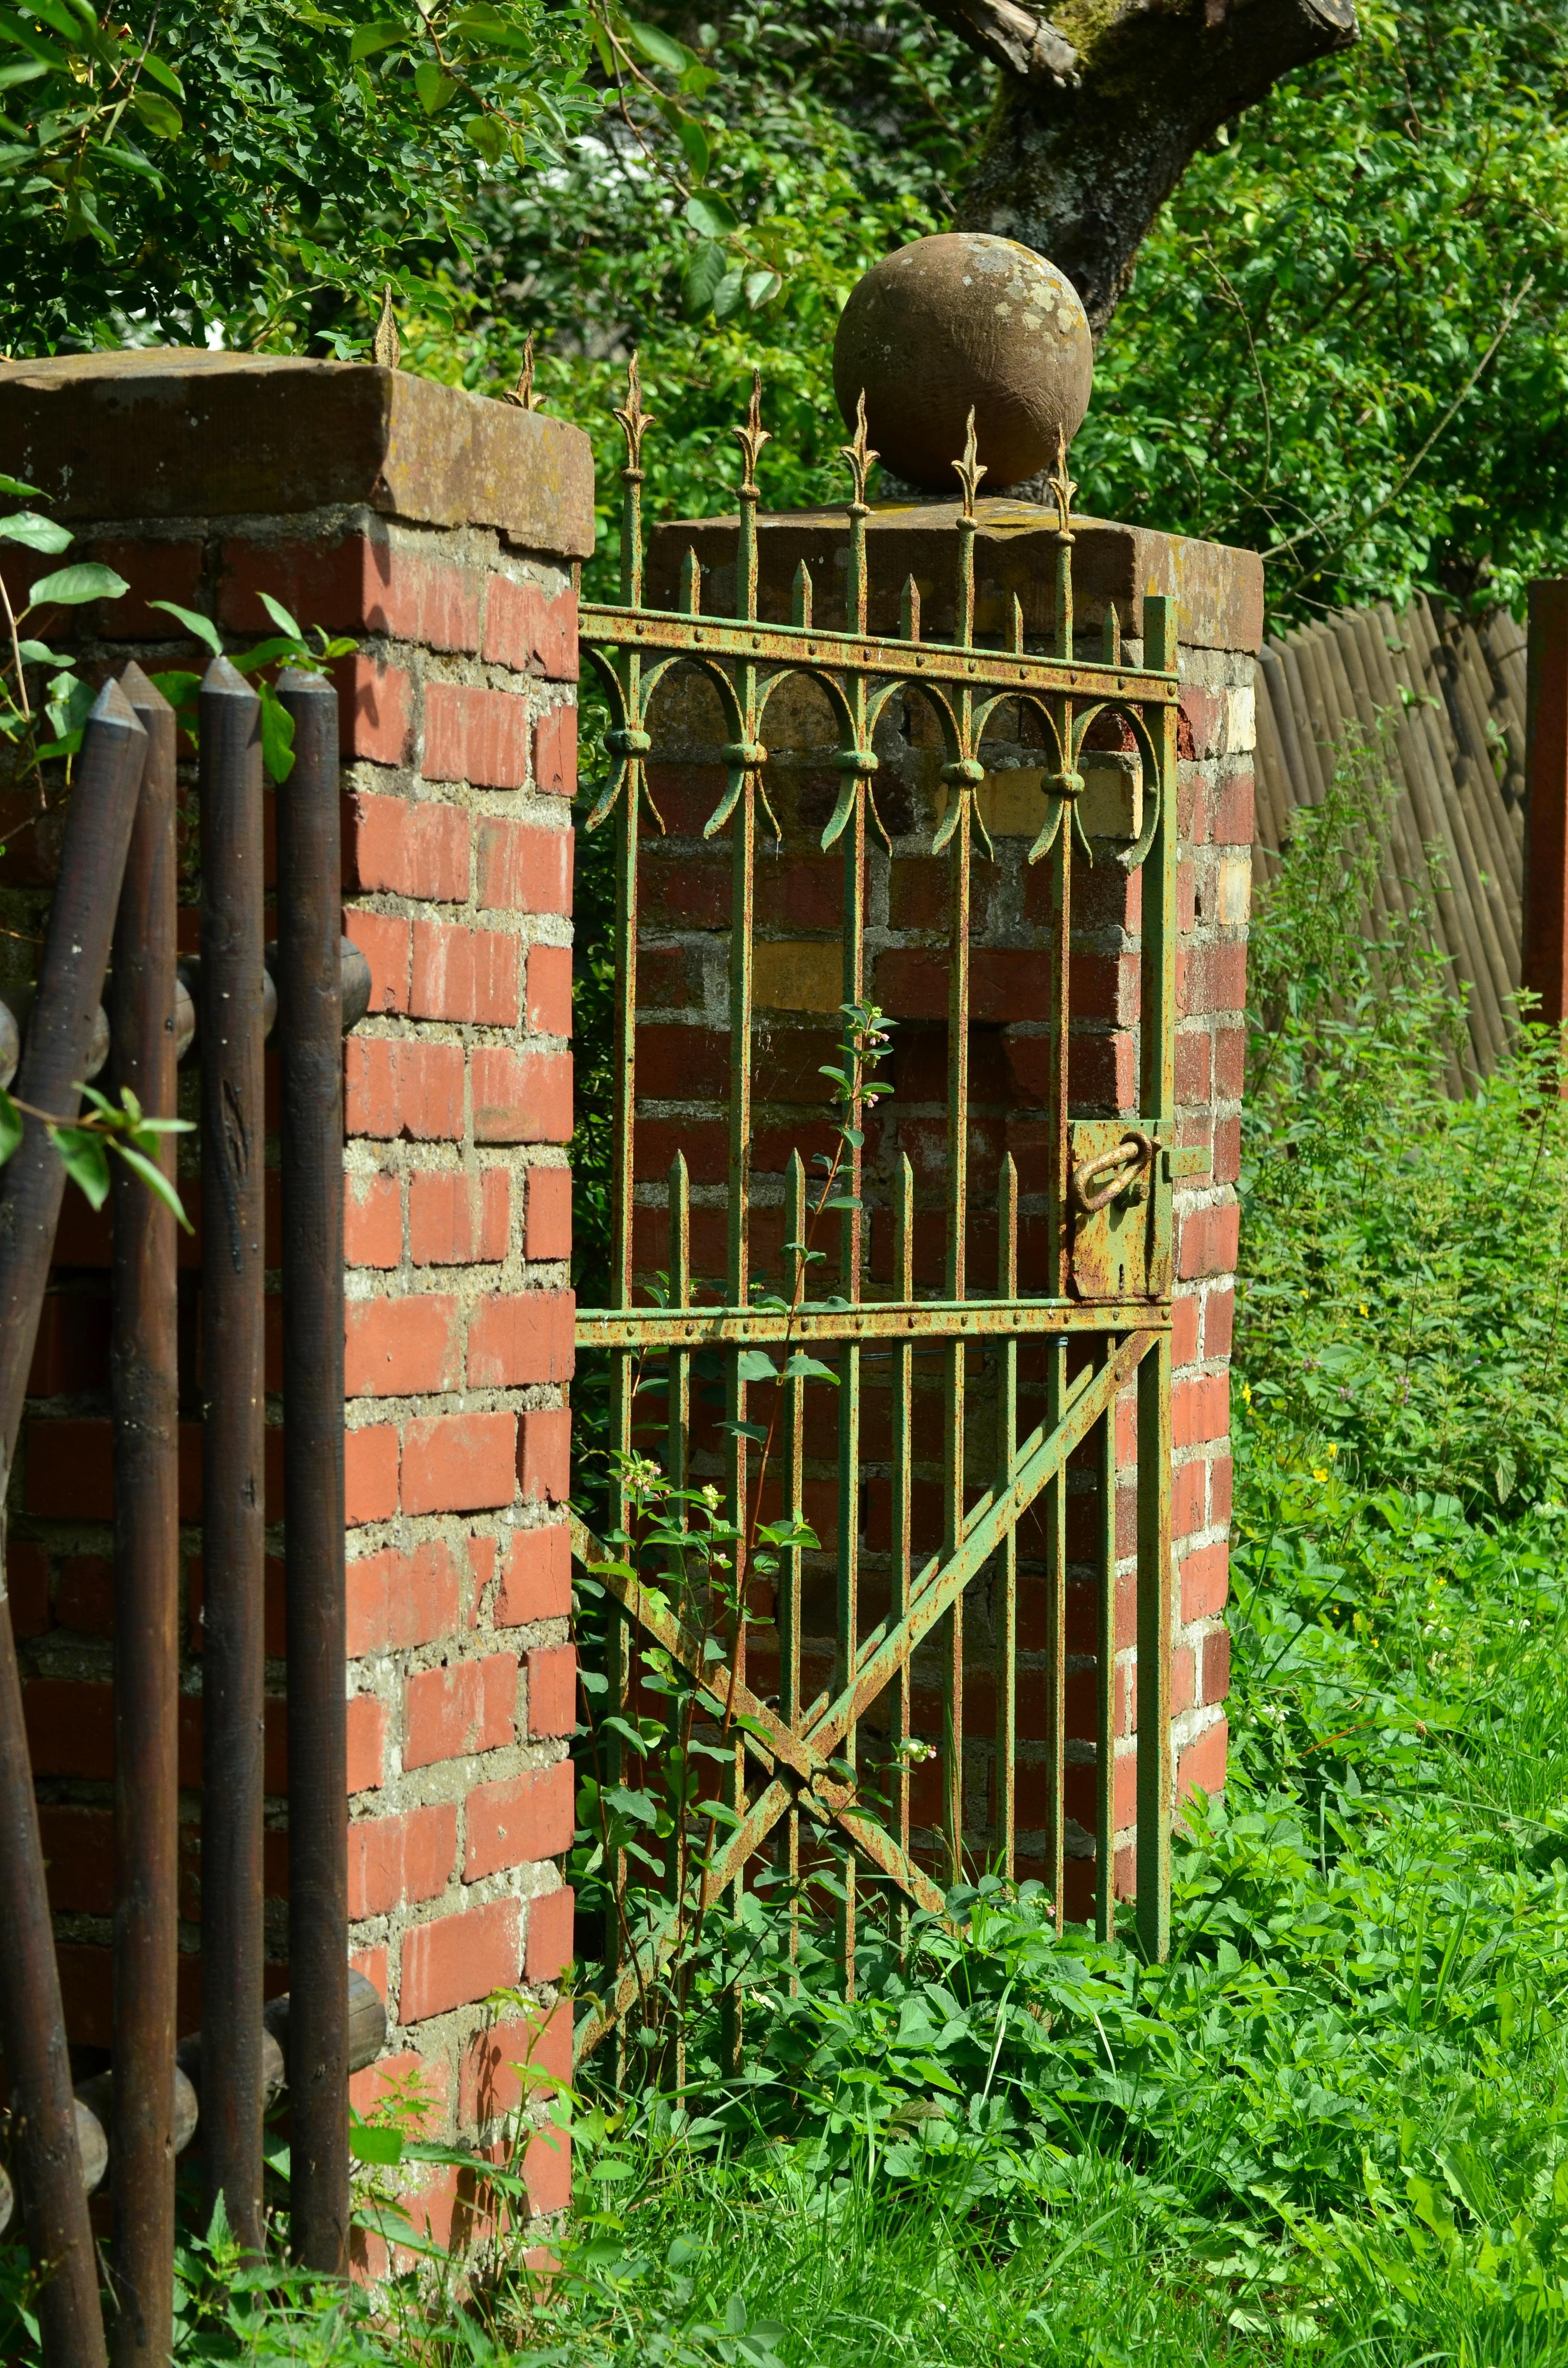 Gratis billeder stolpe gr spl ne gammel sten for Door to gate kontakt